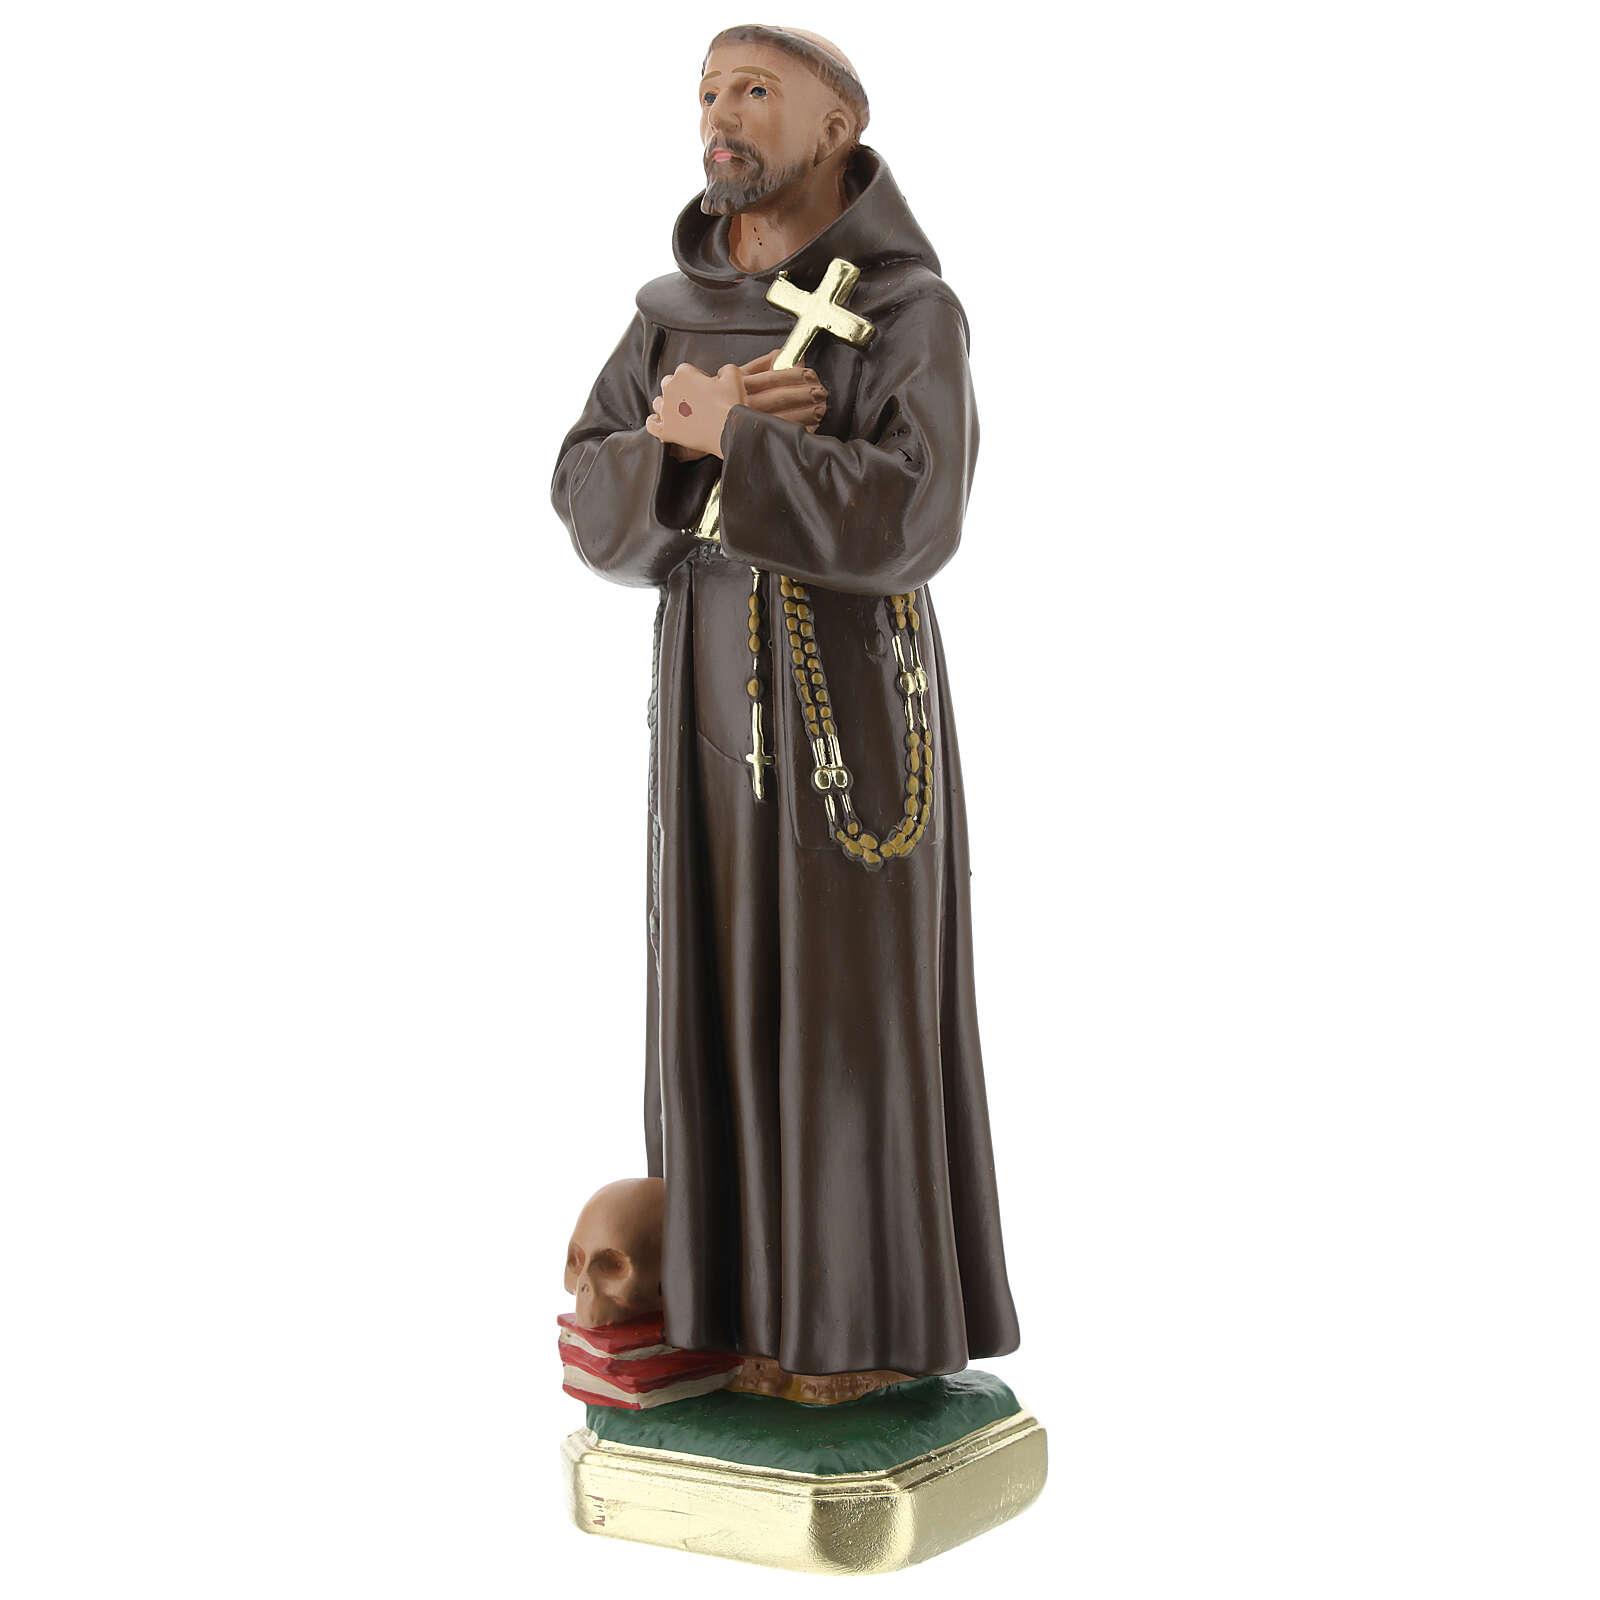 St. Francis of Assisi plaster statue 20 cm hand painted Arte Barsanti 4